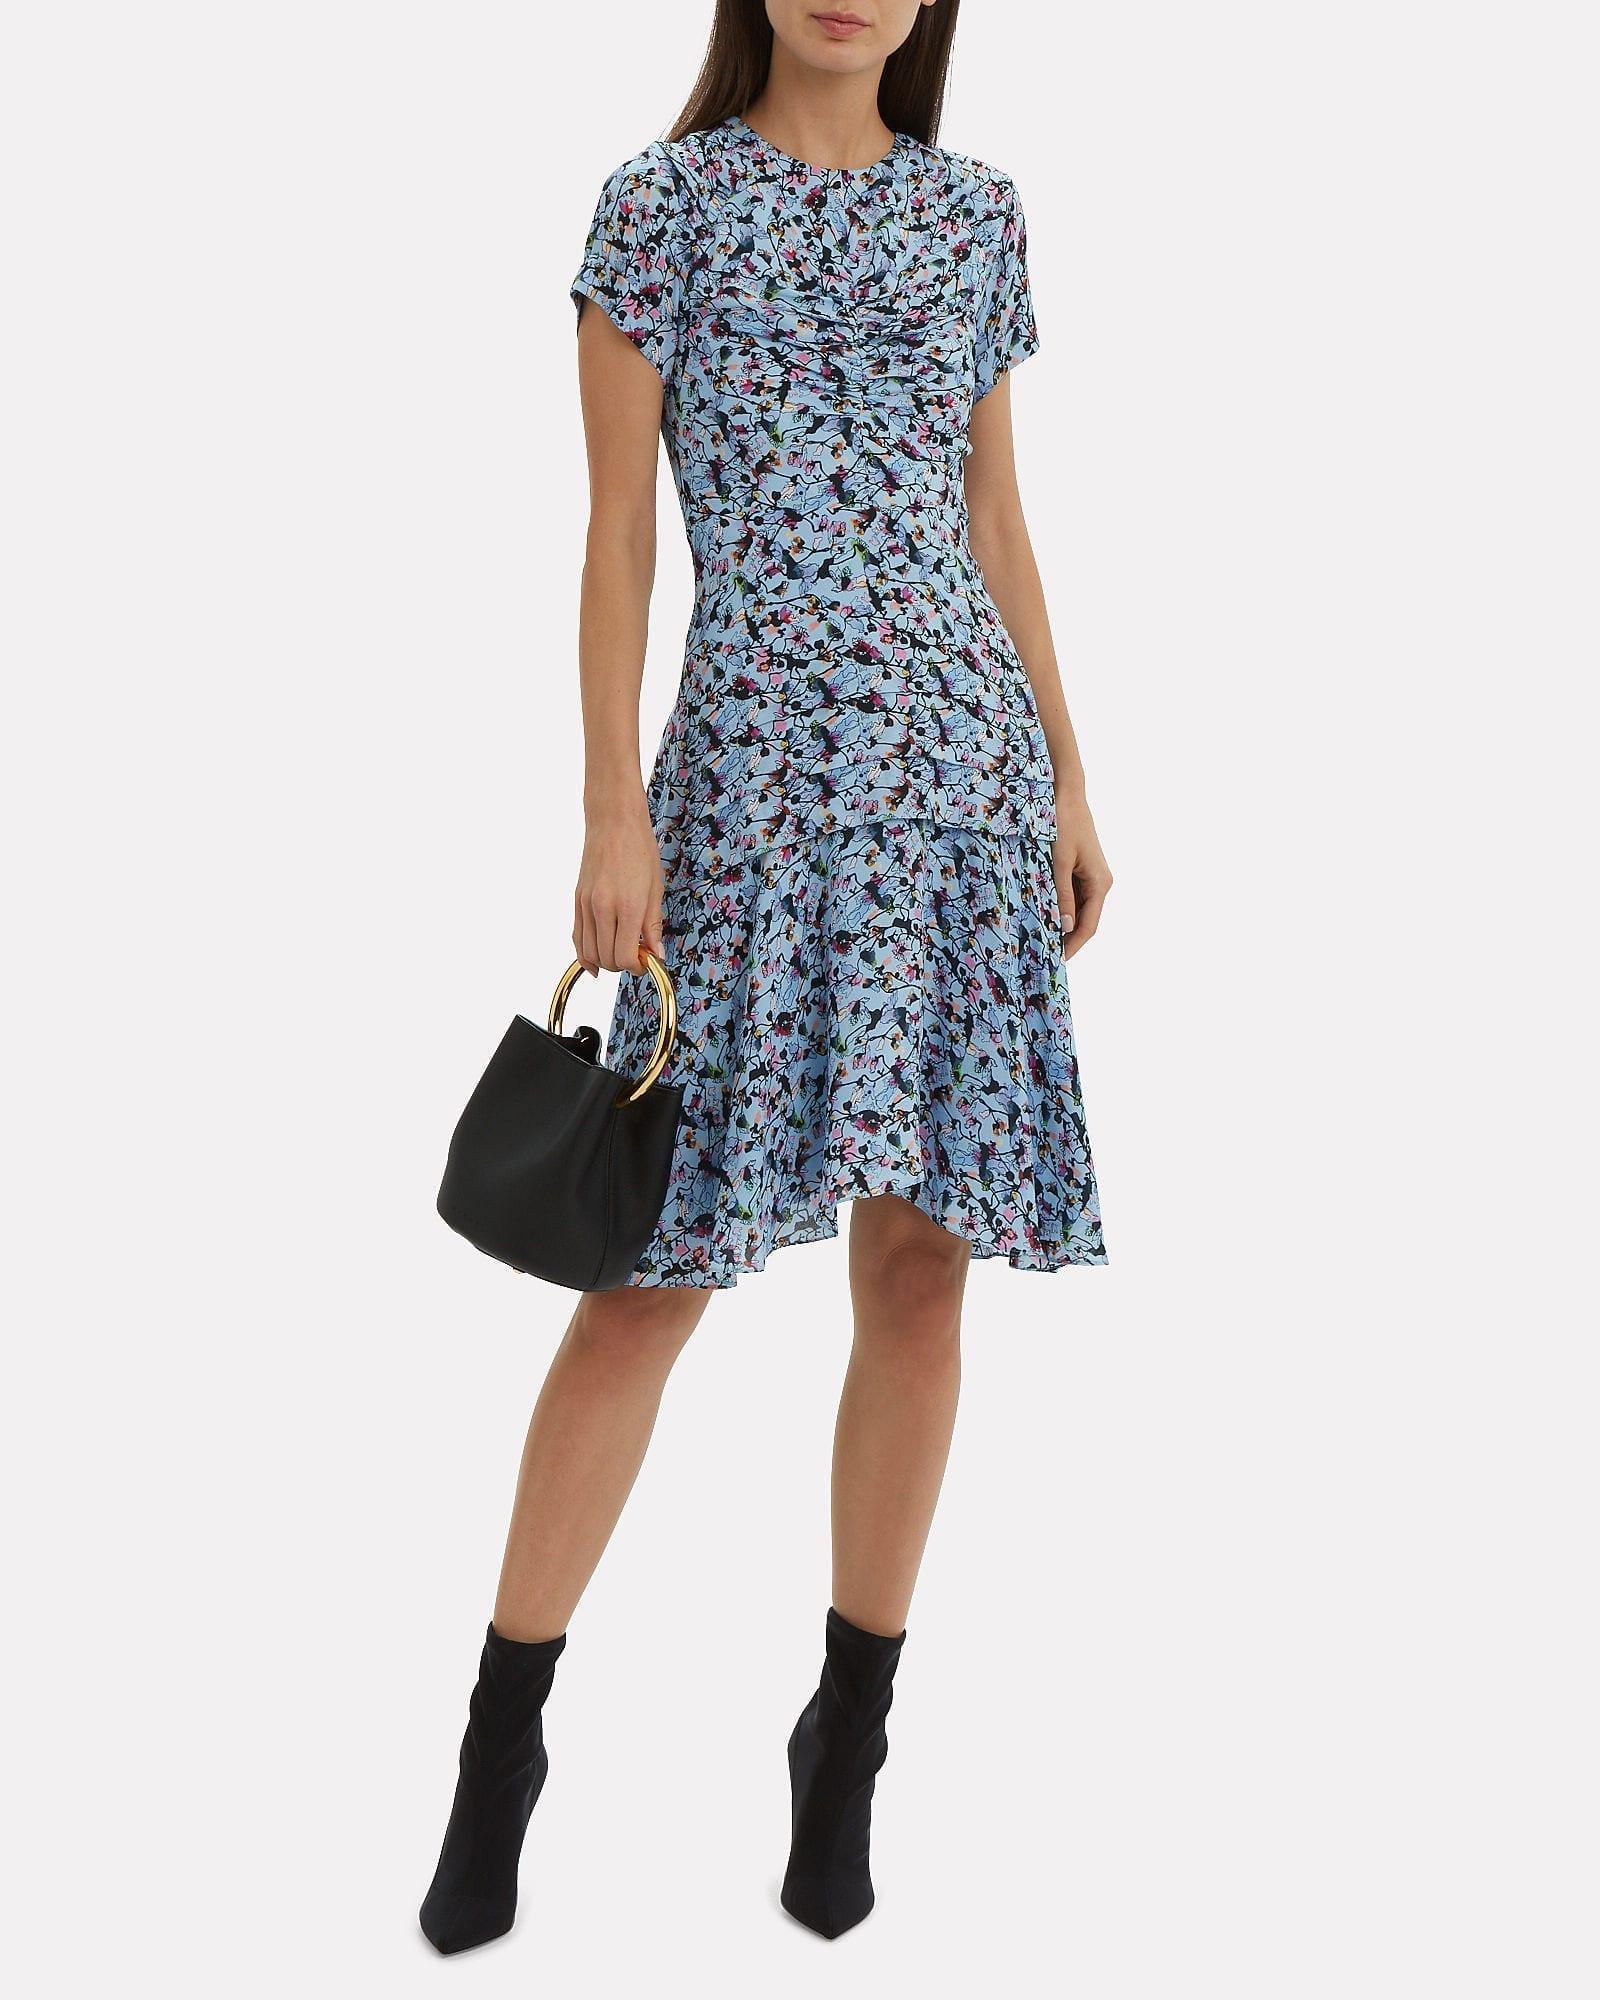 JASON WU Blue / Floral Printed Dress